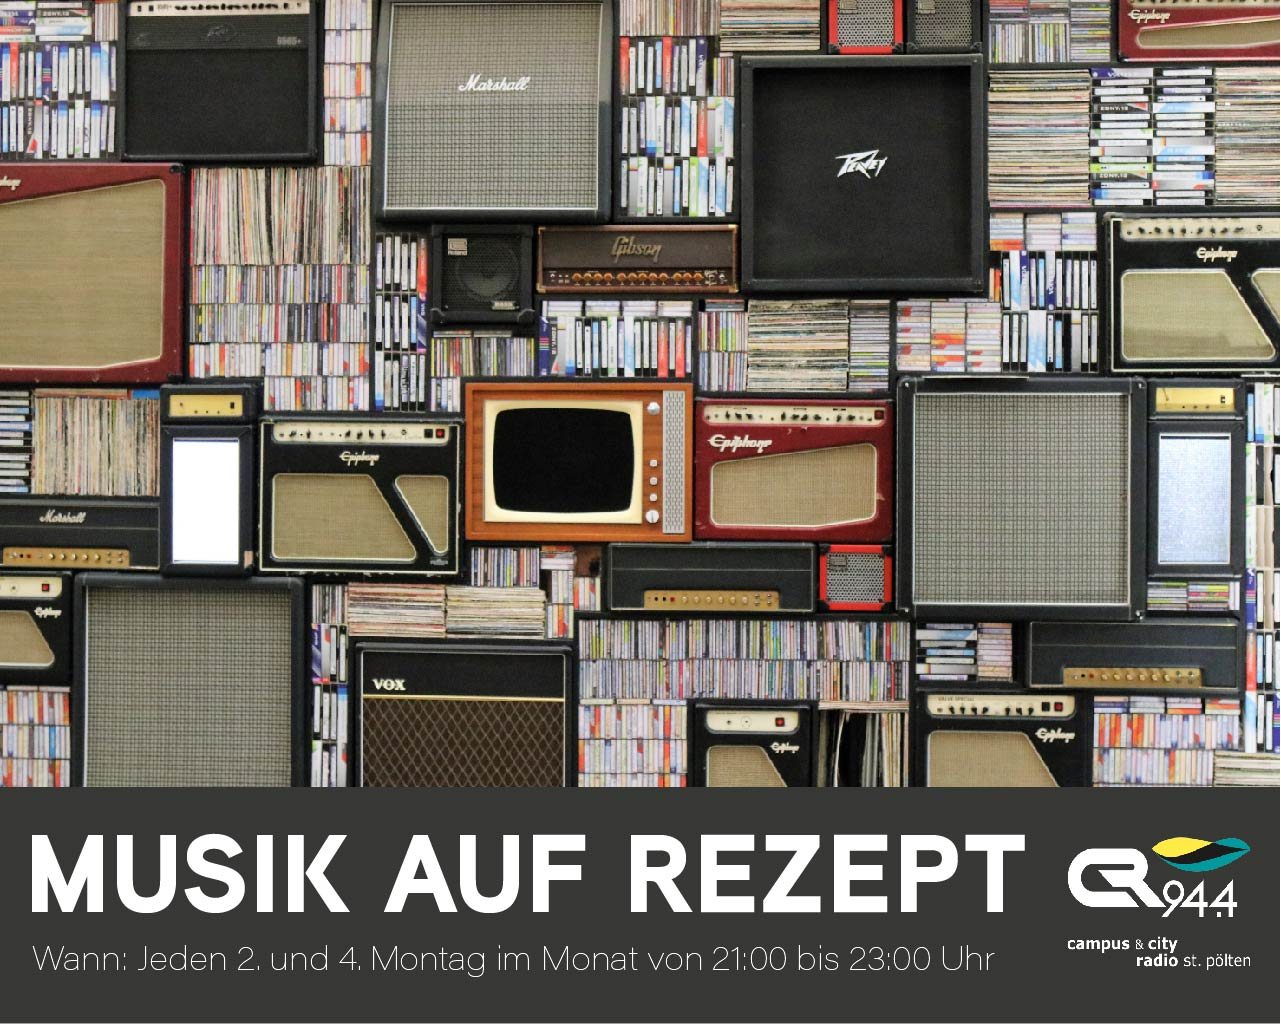 Tobis Musik auf Rezept: Kirsa live im Studio, 12.10.,21.00